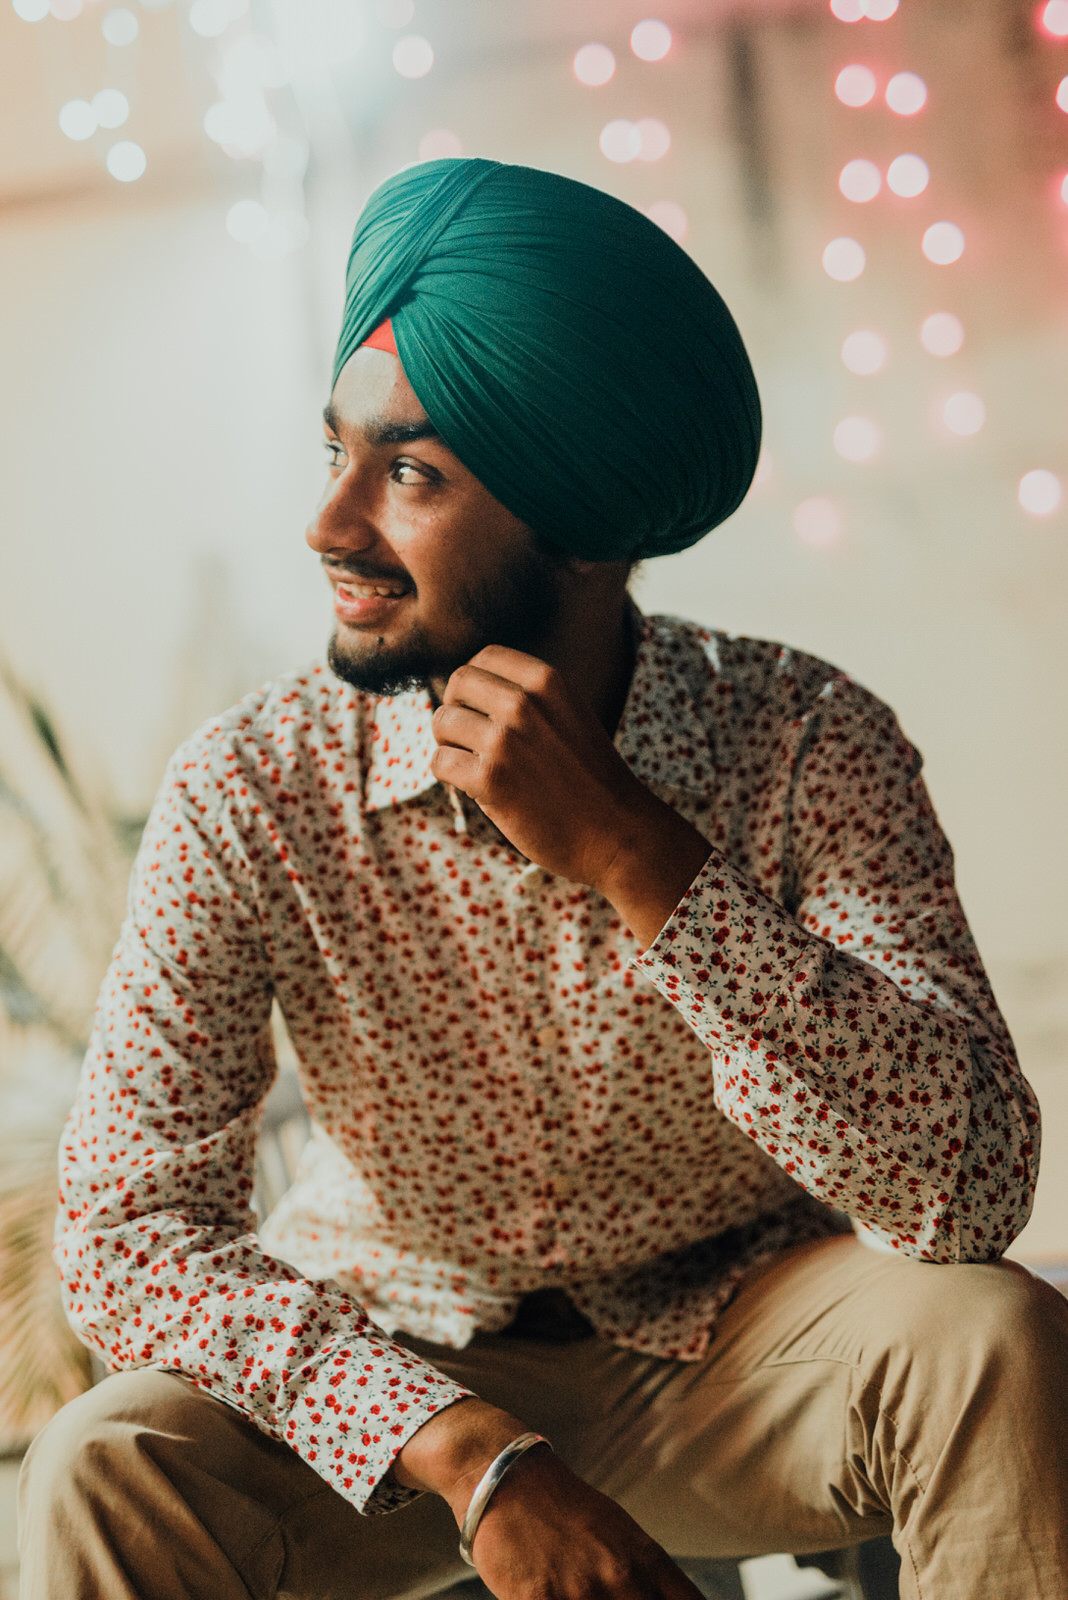 Sikh Male Portrait Punjab.jpg